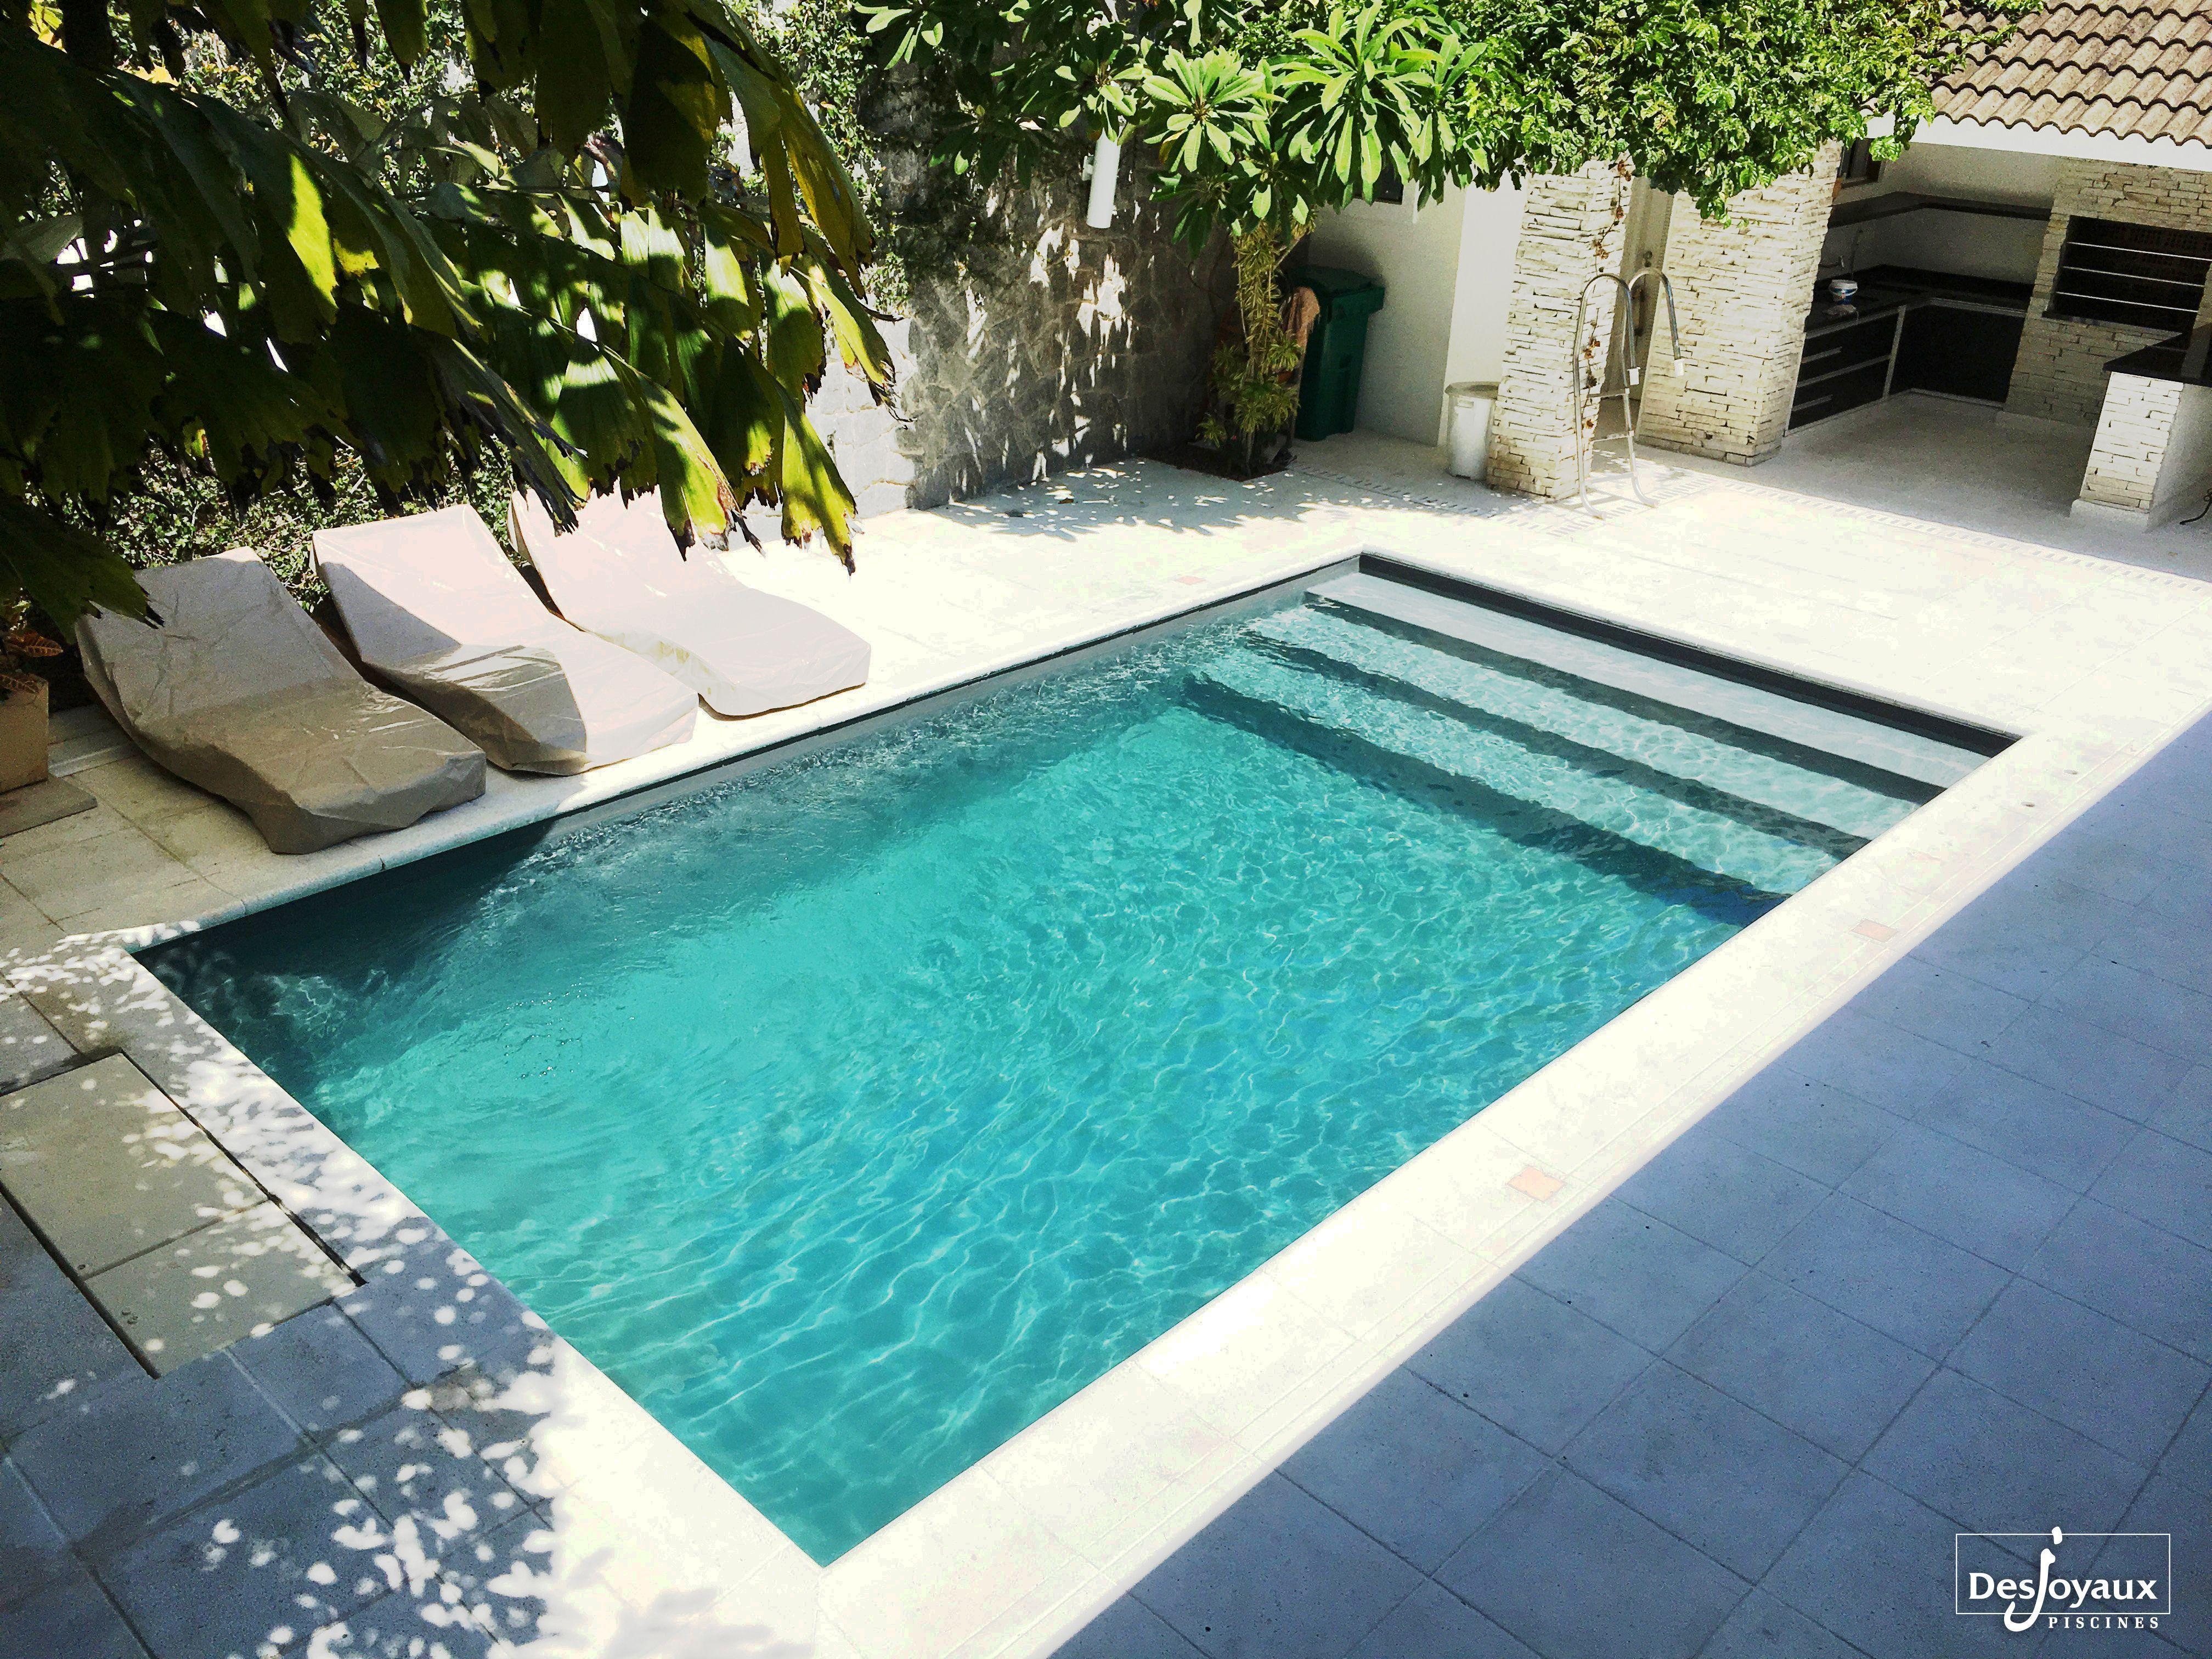 Simplicity And Sobriety For This Beautiful Piscinerectangulaire Backyardplantsideasfl Pools Backyard Inground Backyard Pool Landscaping Small Inground Pool